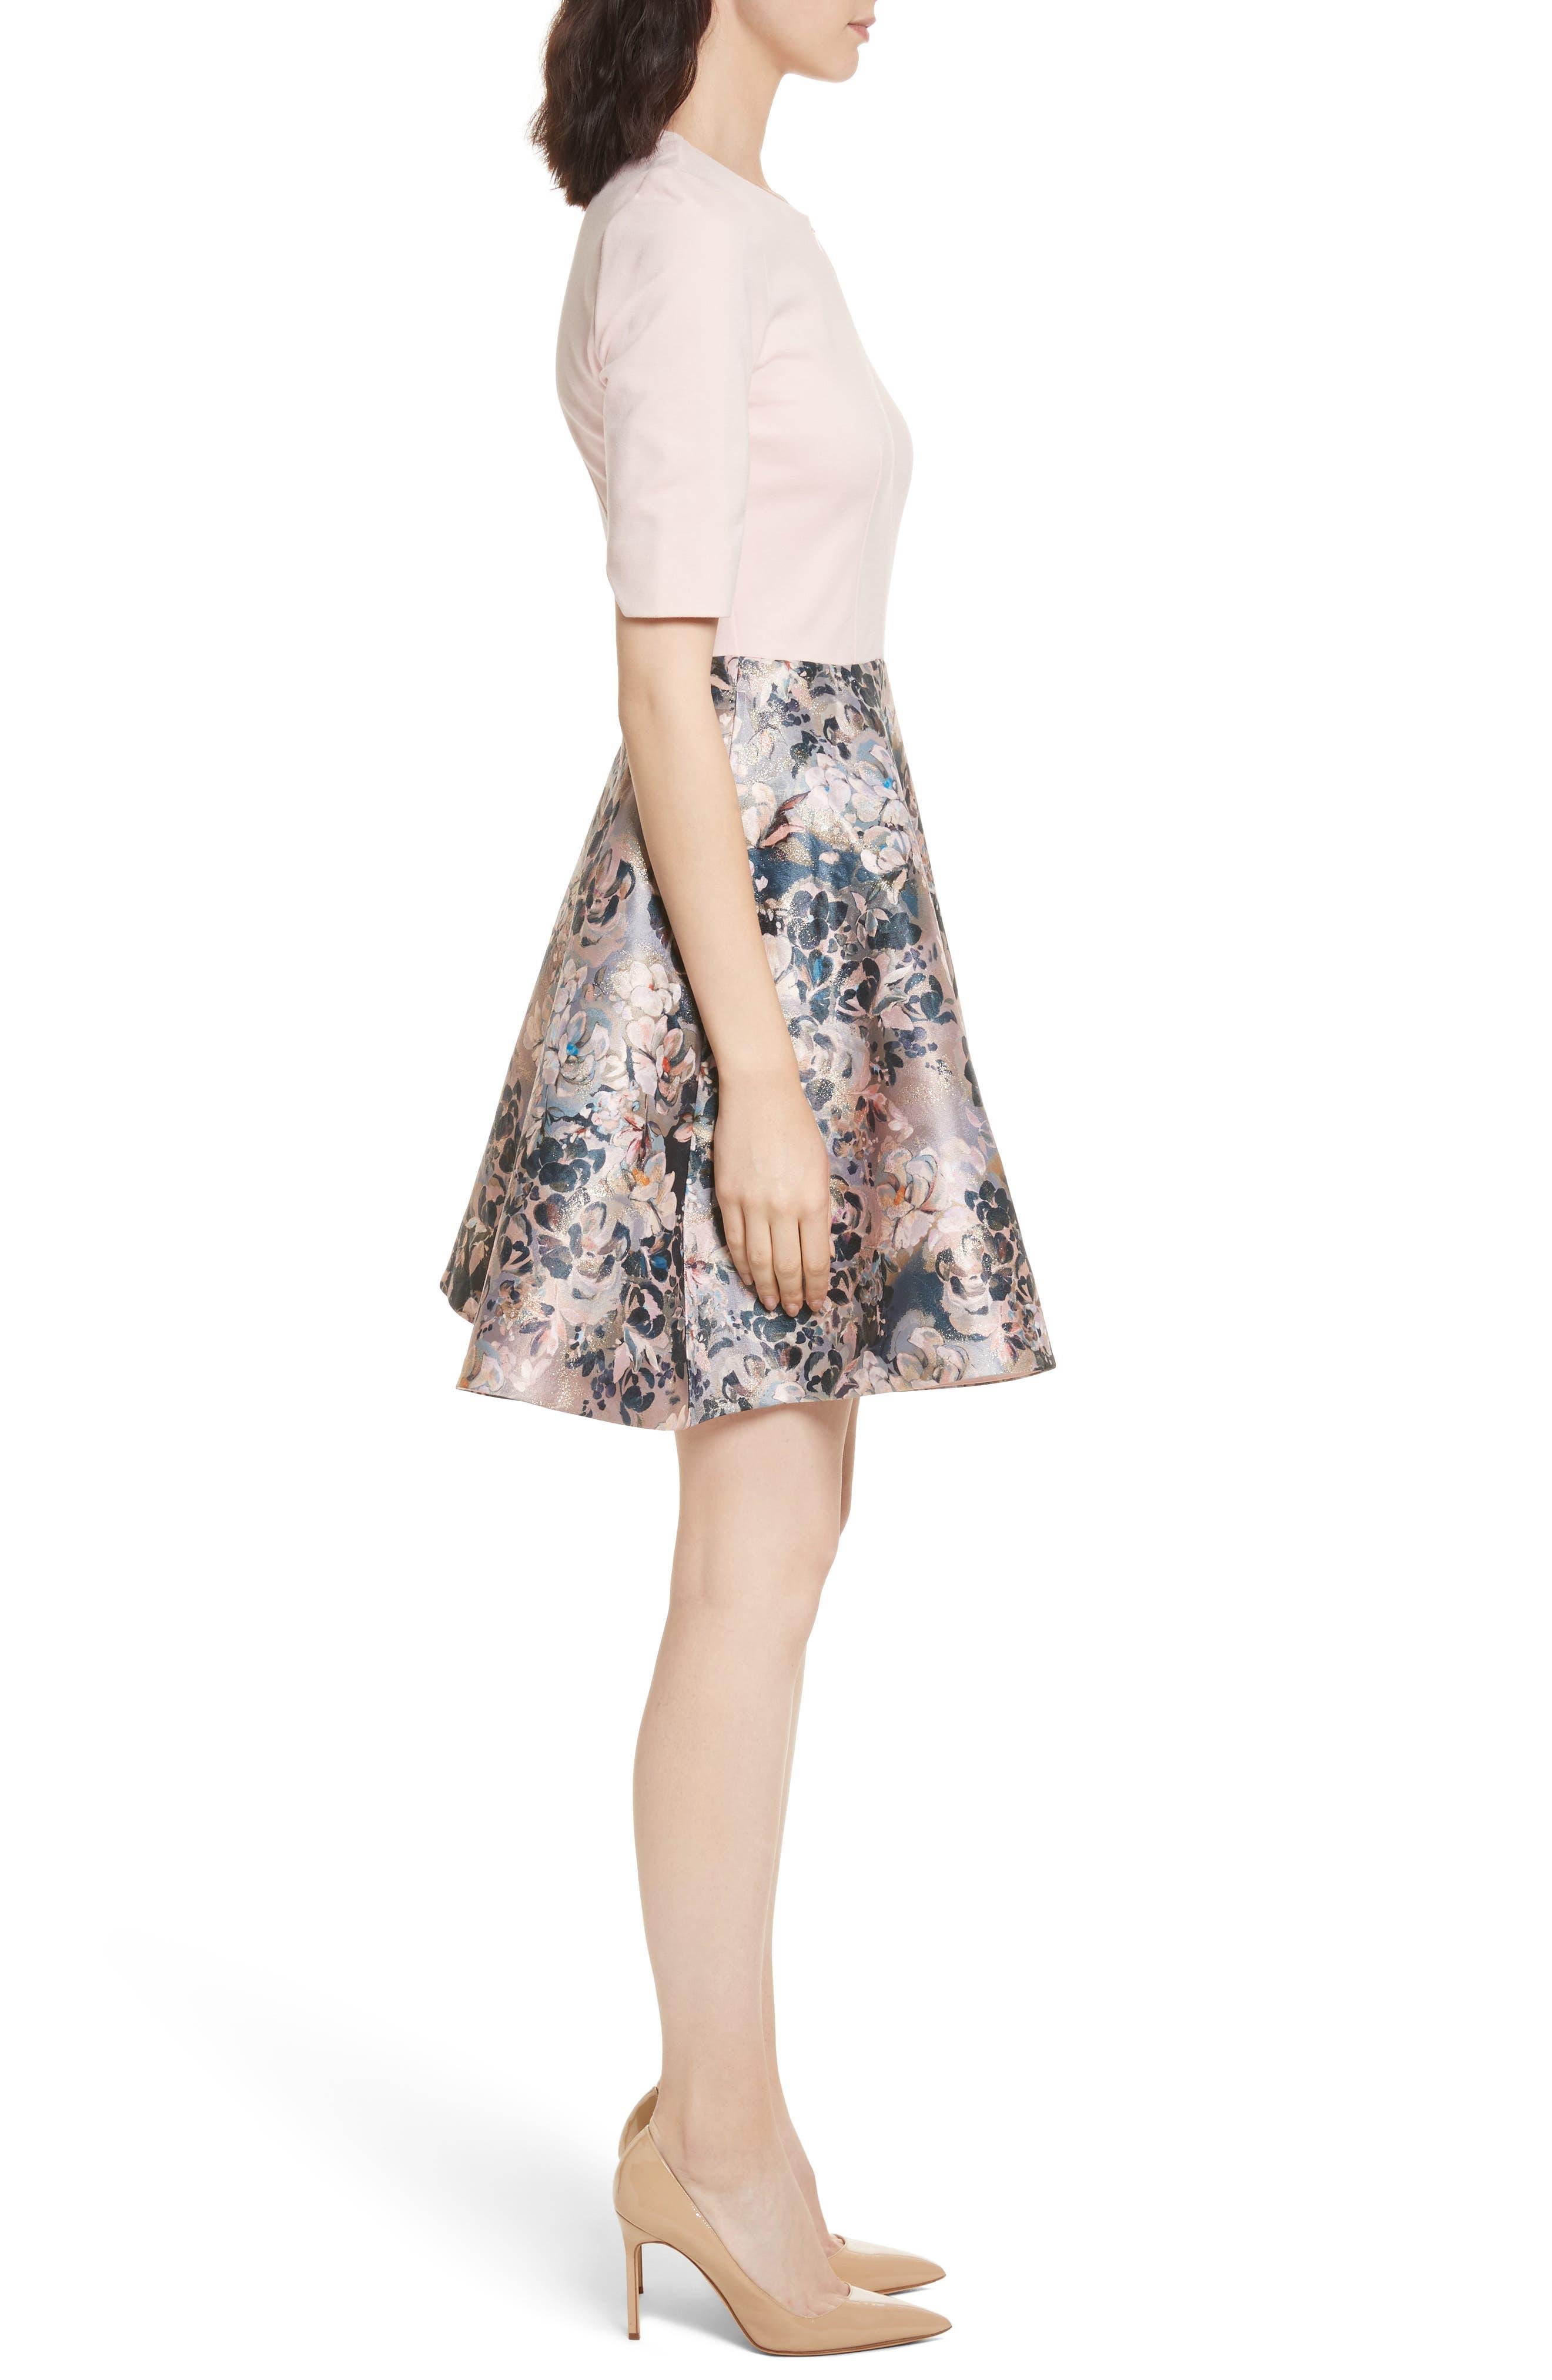 Eloquent Jacquard Skater Dress,                             Alternate thumbnail 3, color,                             Pale Pink